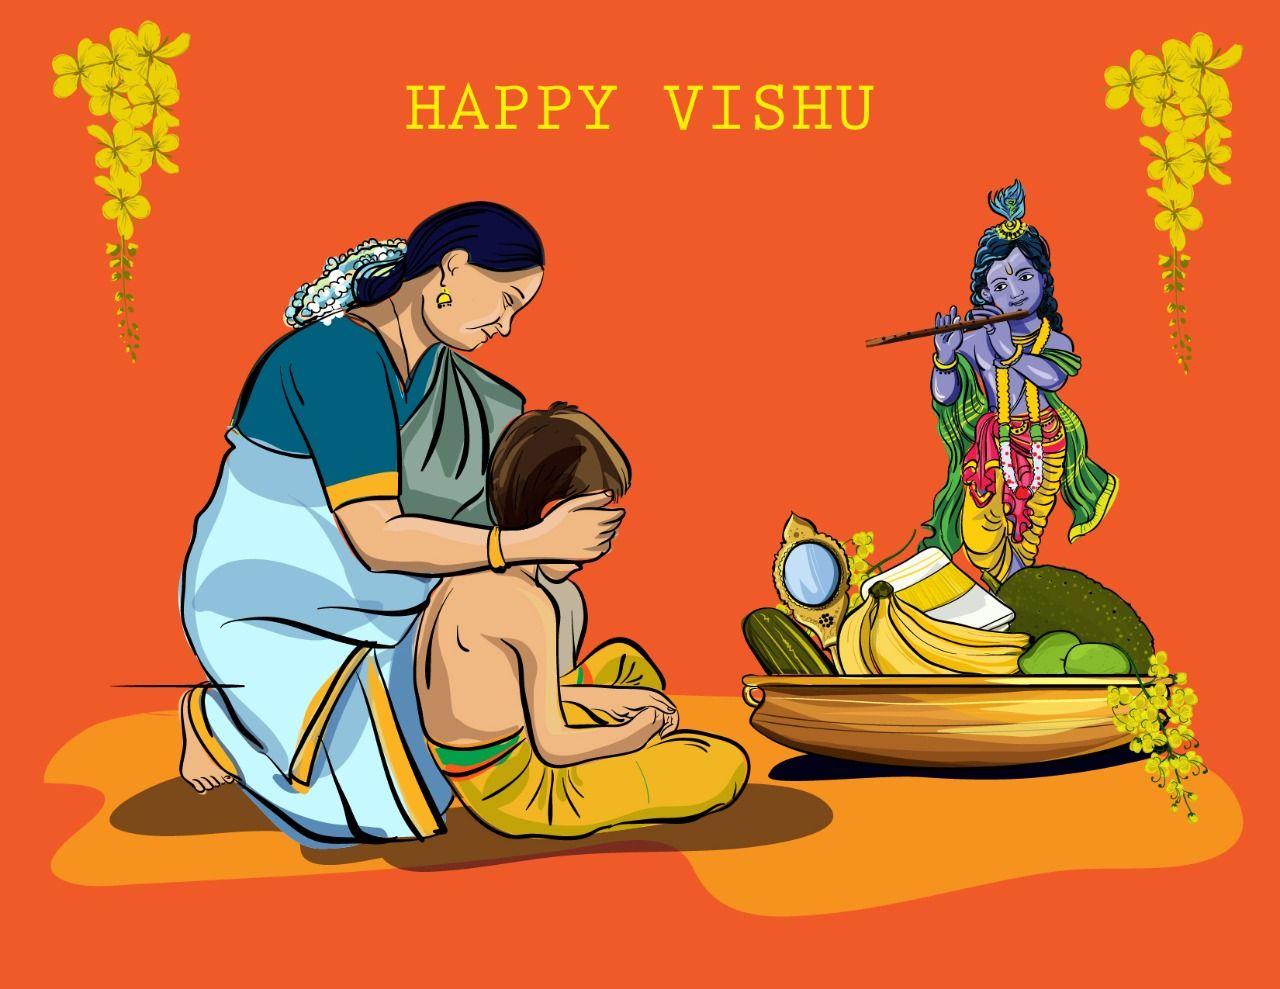 KERALA FESTIVAL: Vishu Kani